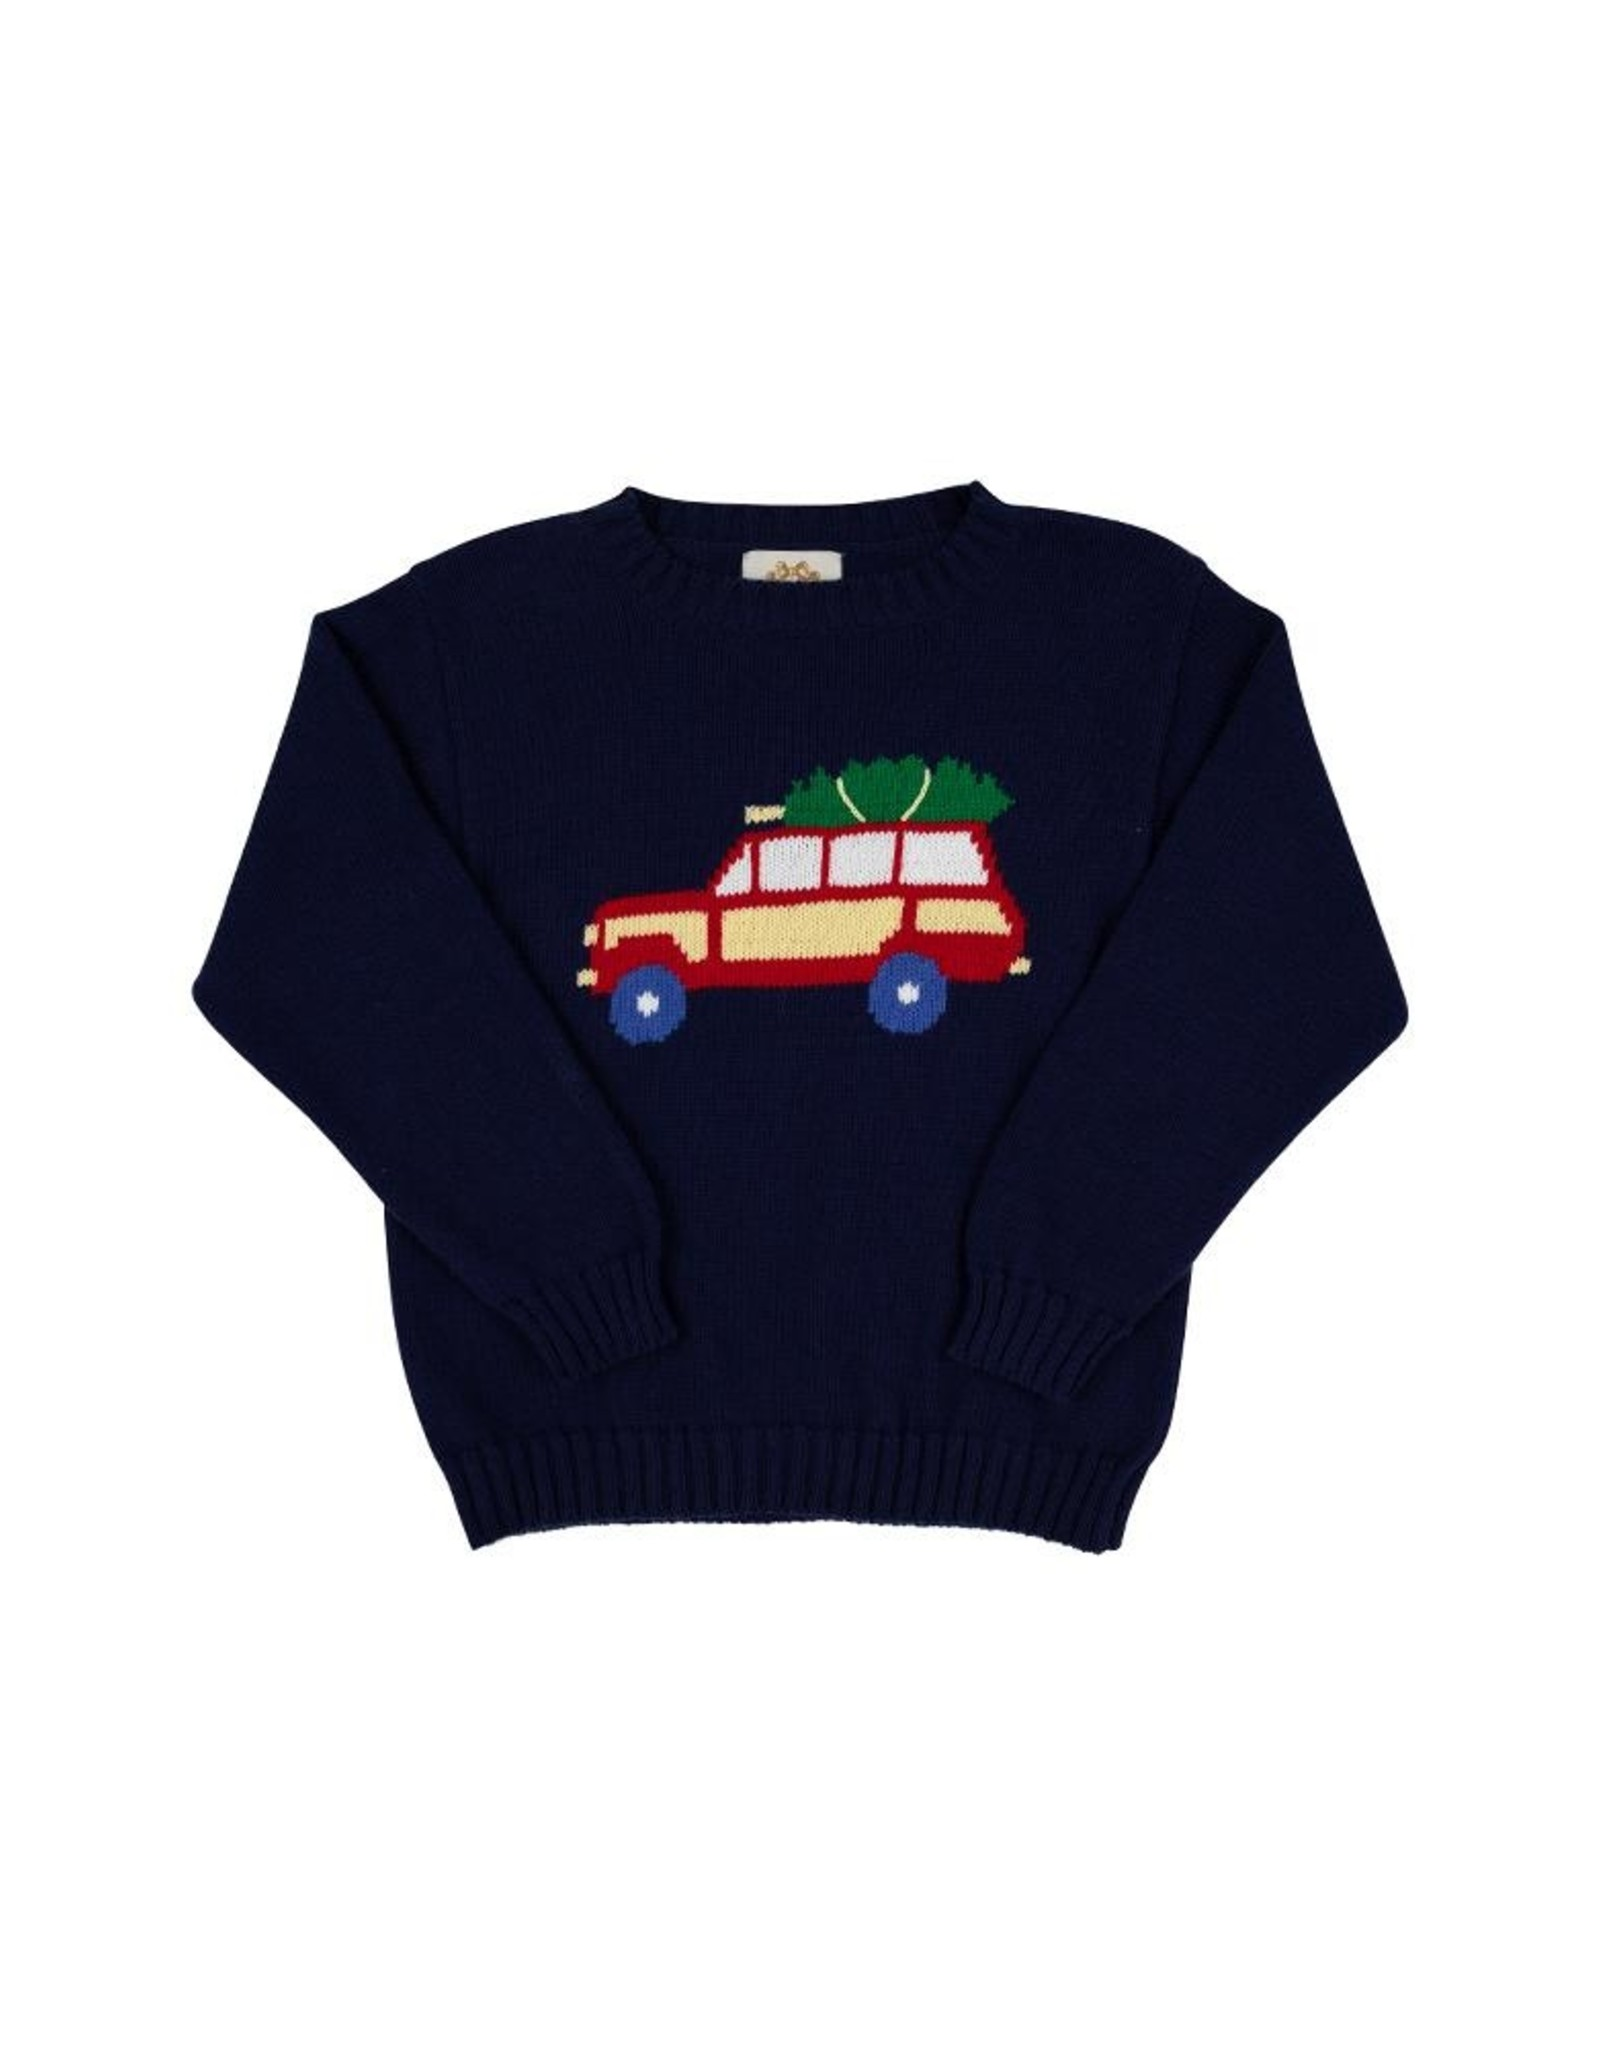 The Beaufort Bonnet Company Isaacs Intarsia Jeep Sweater